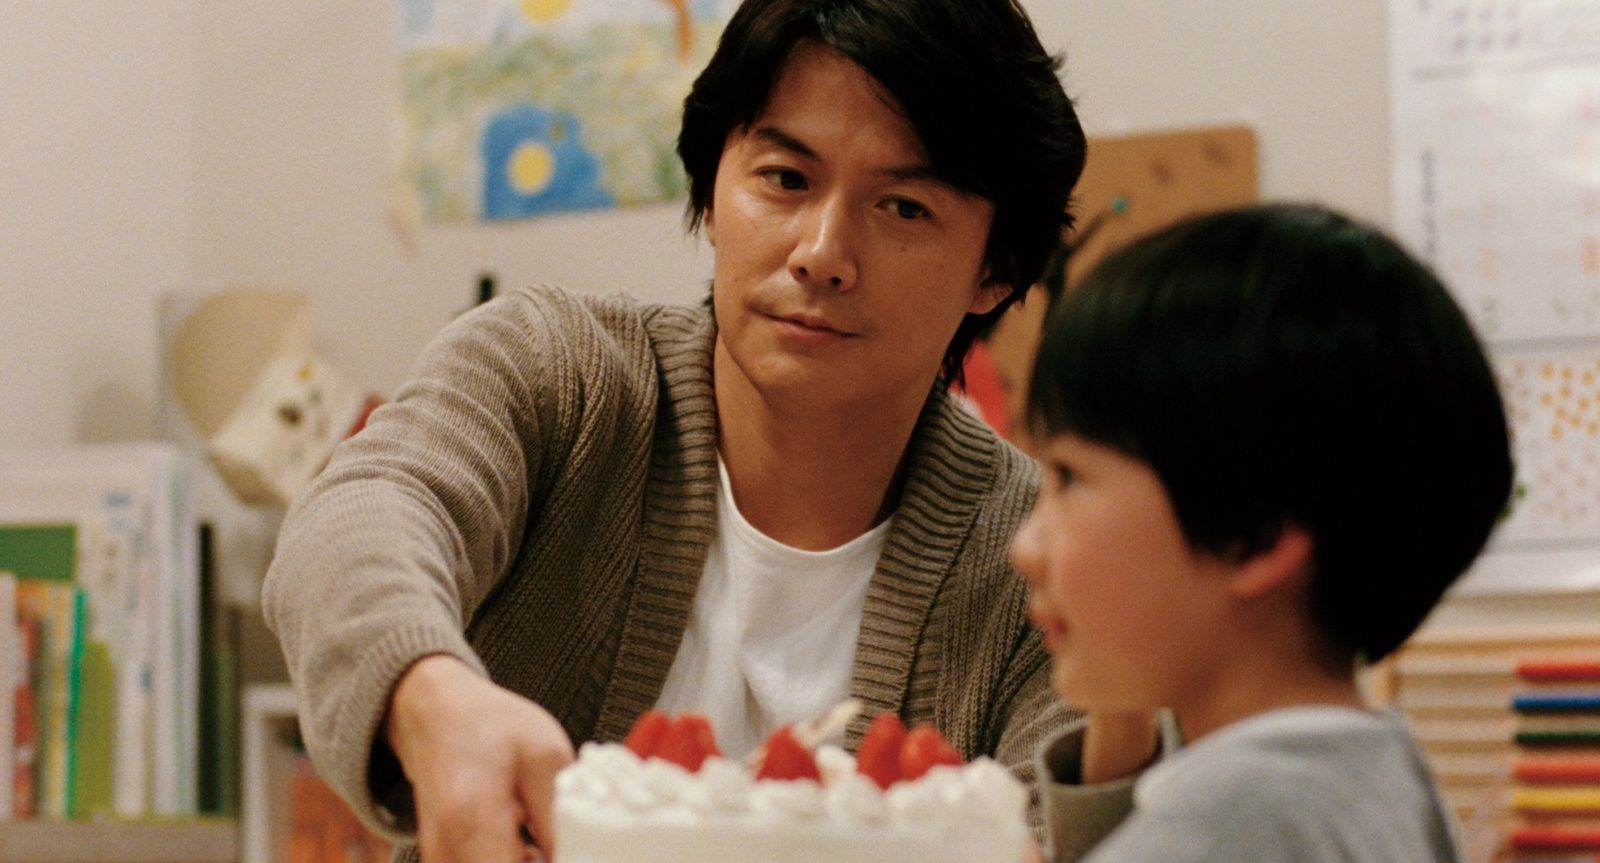 Concours : Tel père, tel fils de Hirokazu Kore-Eda